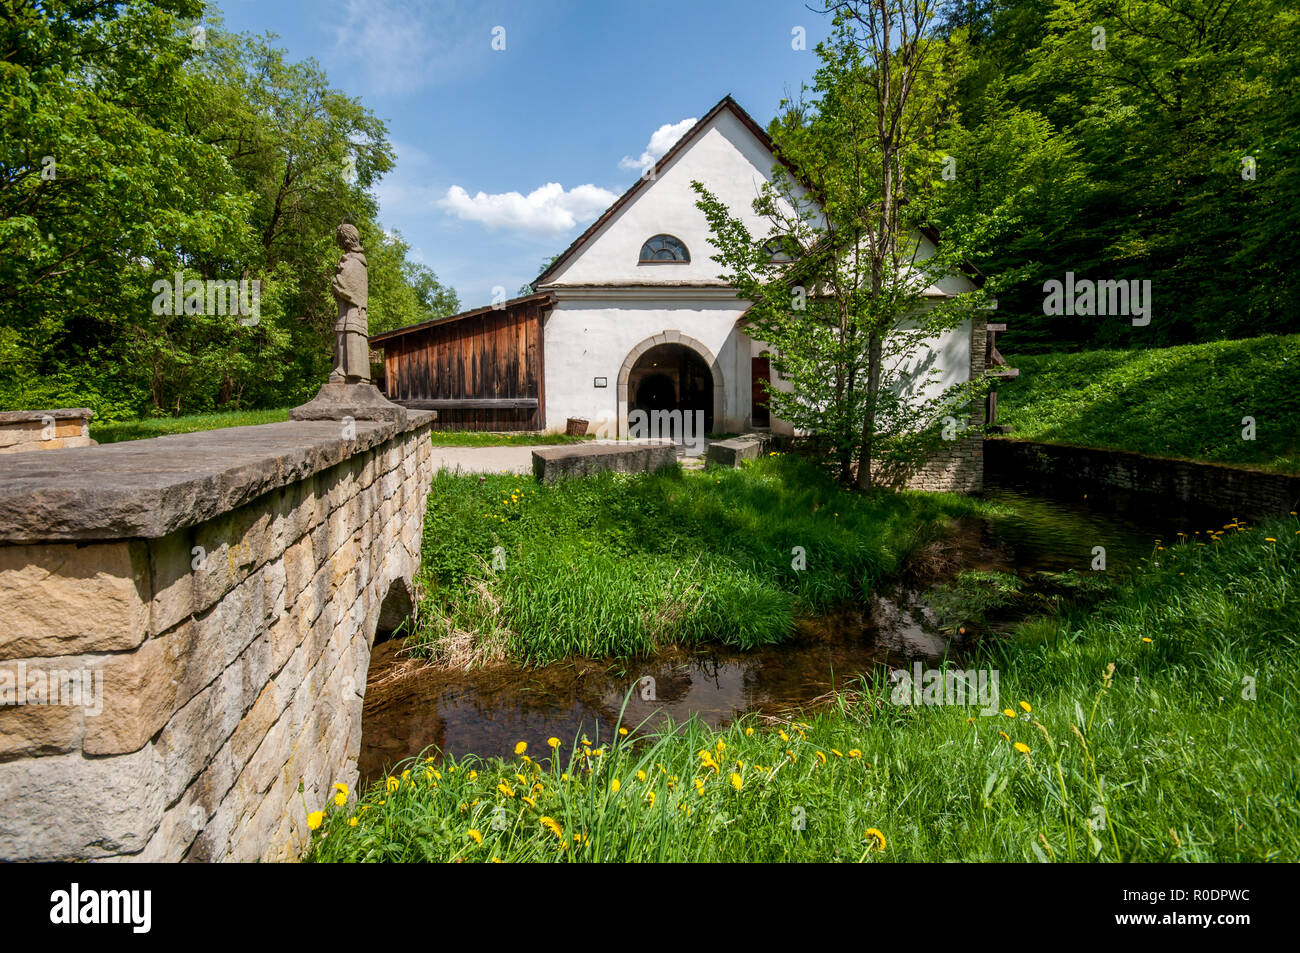 The Wallachian Open Air Museum of folk architecture, Roznov pod Radhostem, Zlin region, - Stock Image